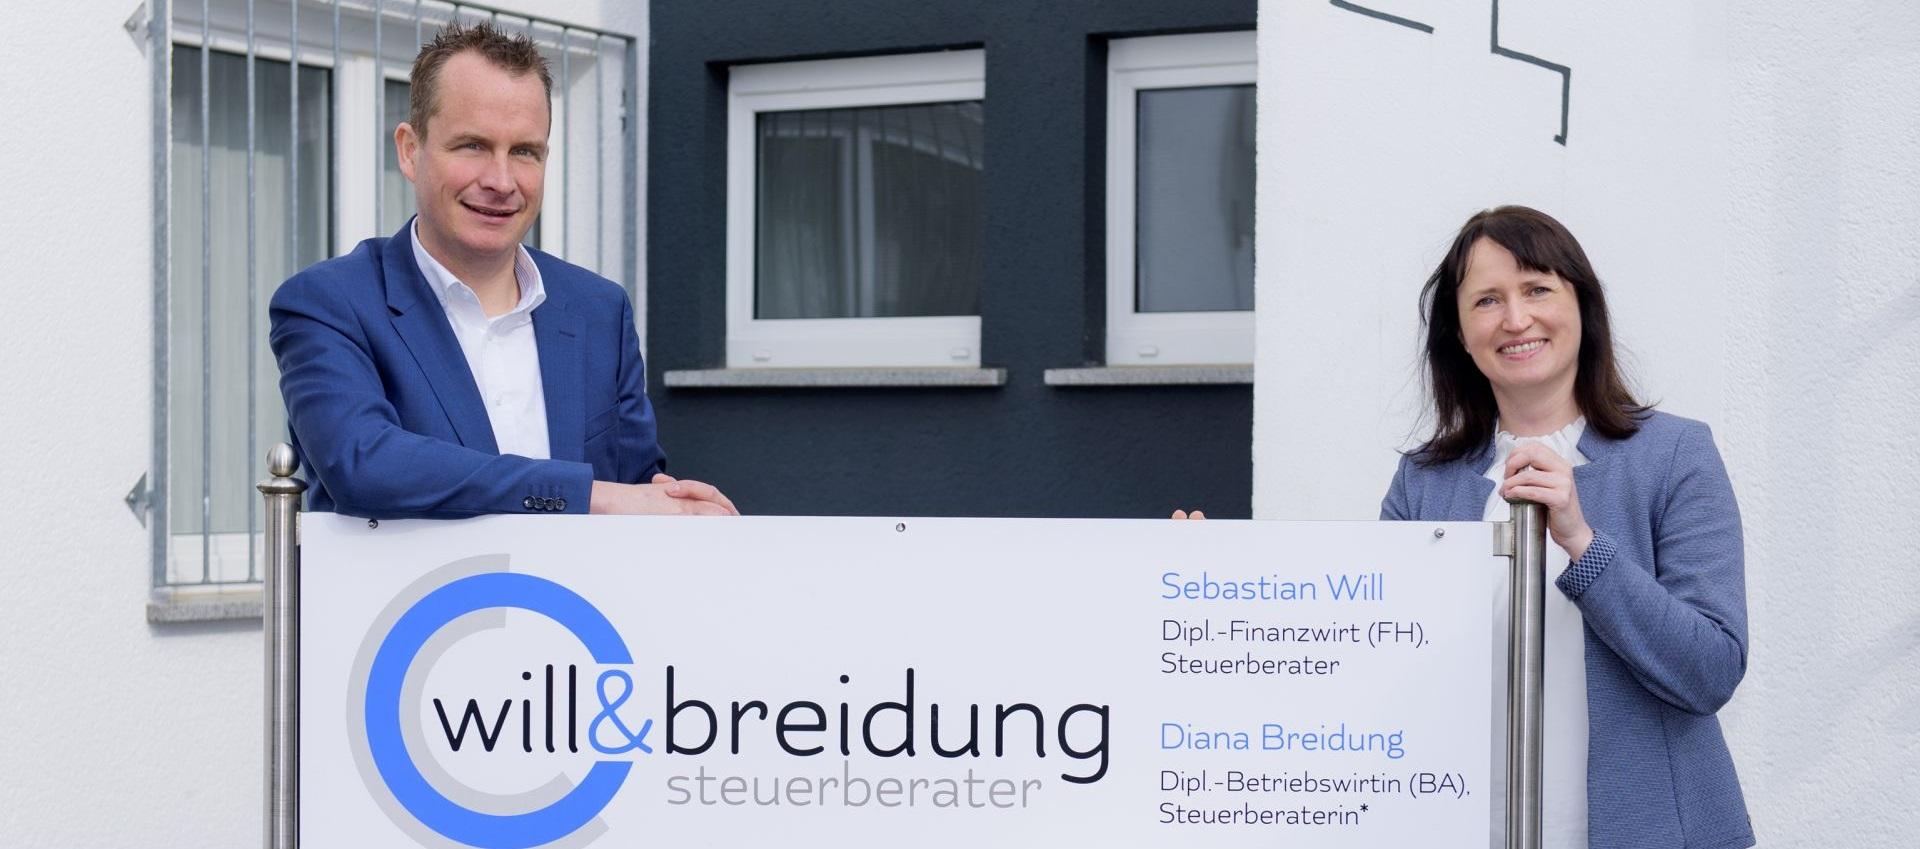 WILL & BREIDUNG STEUERBERATER